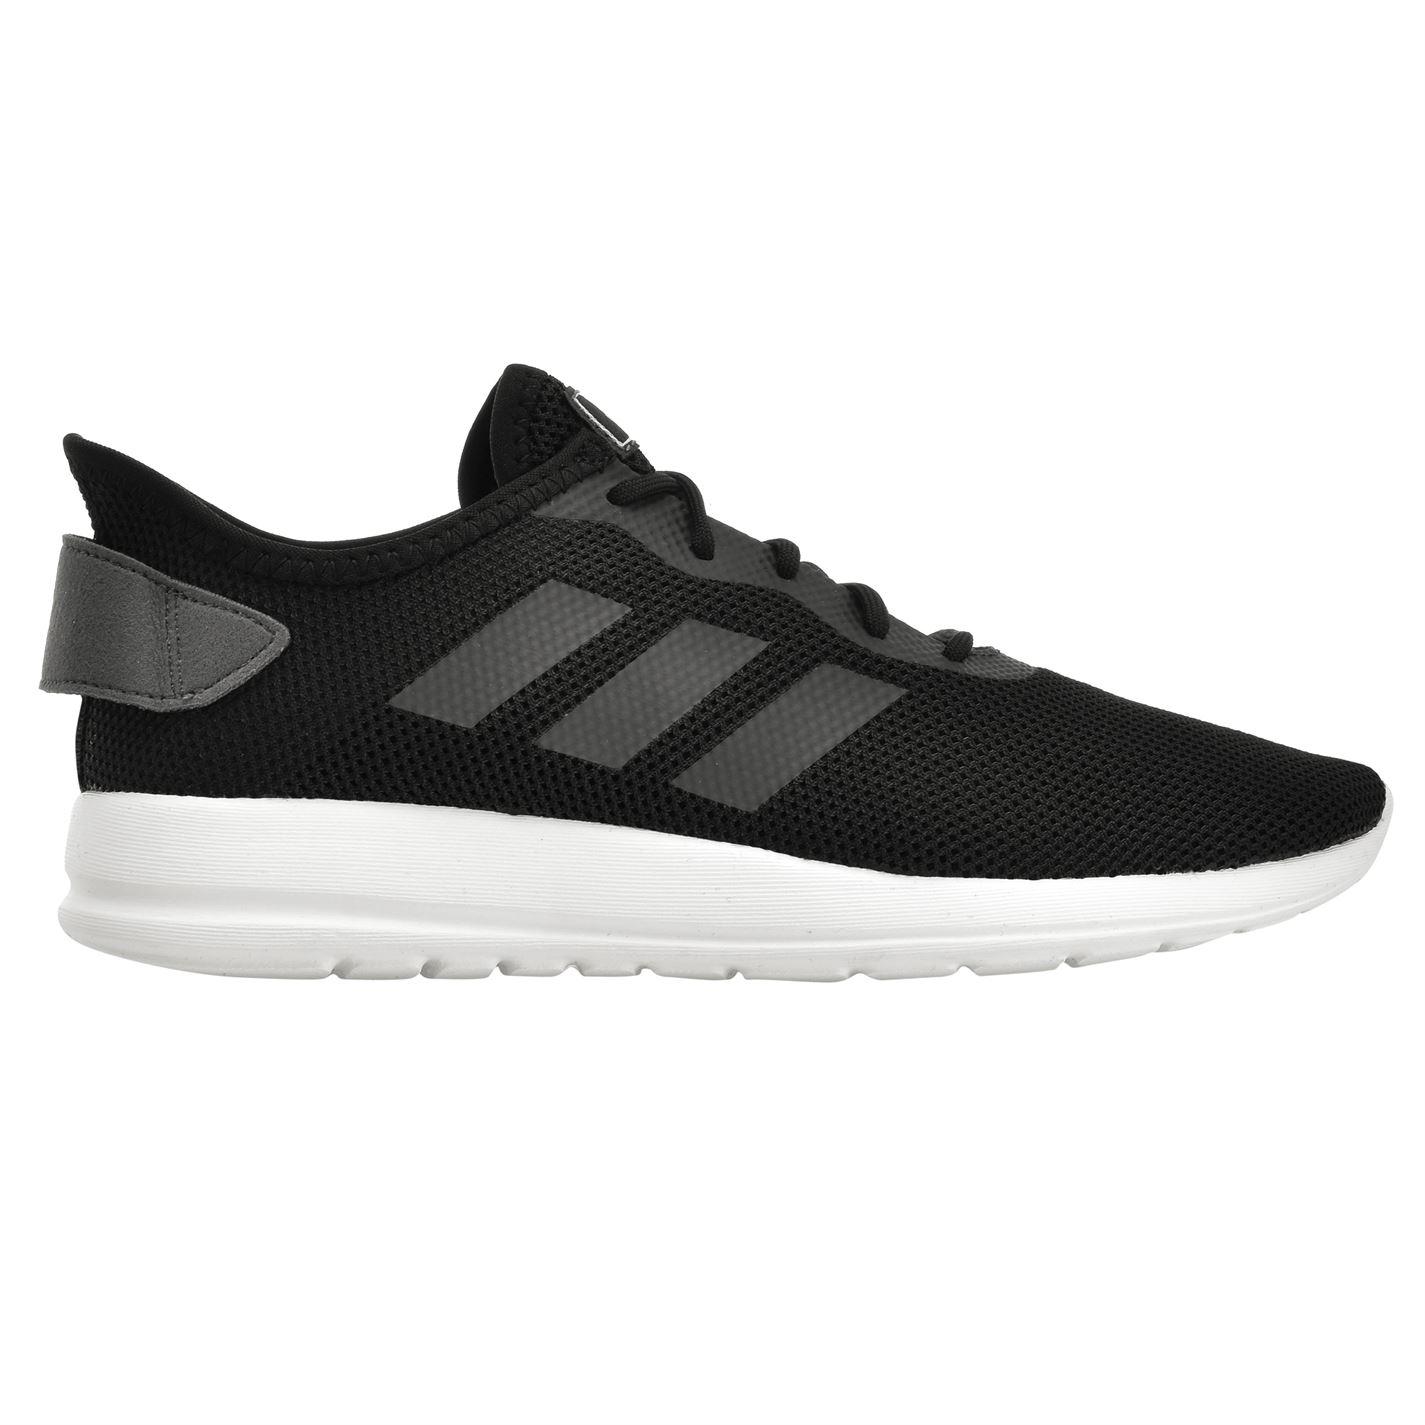 Adidas Yatra Womens Shoes